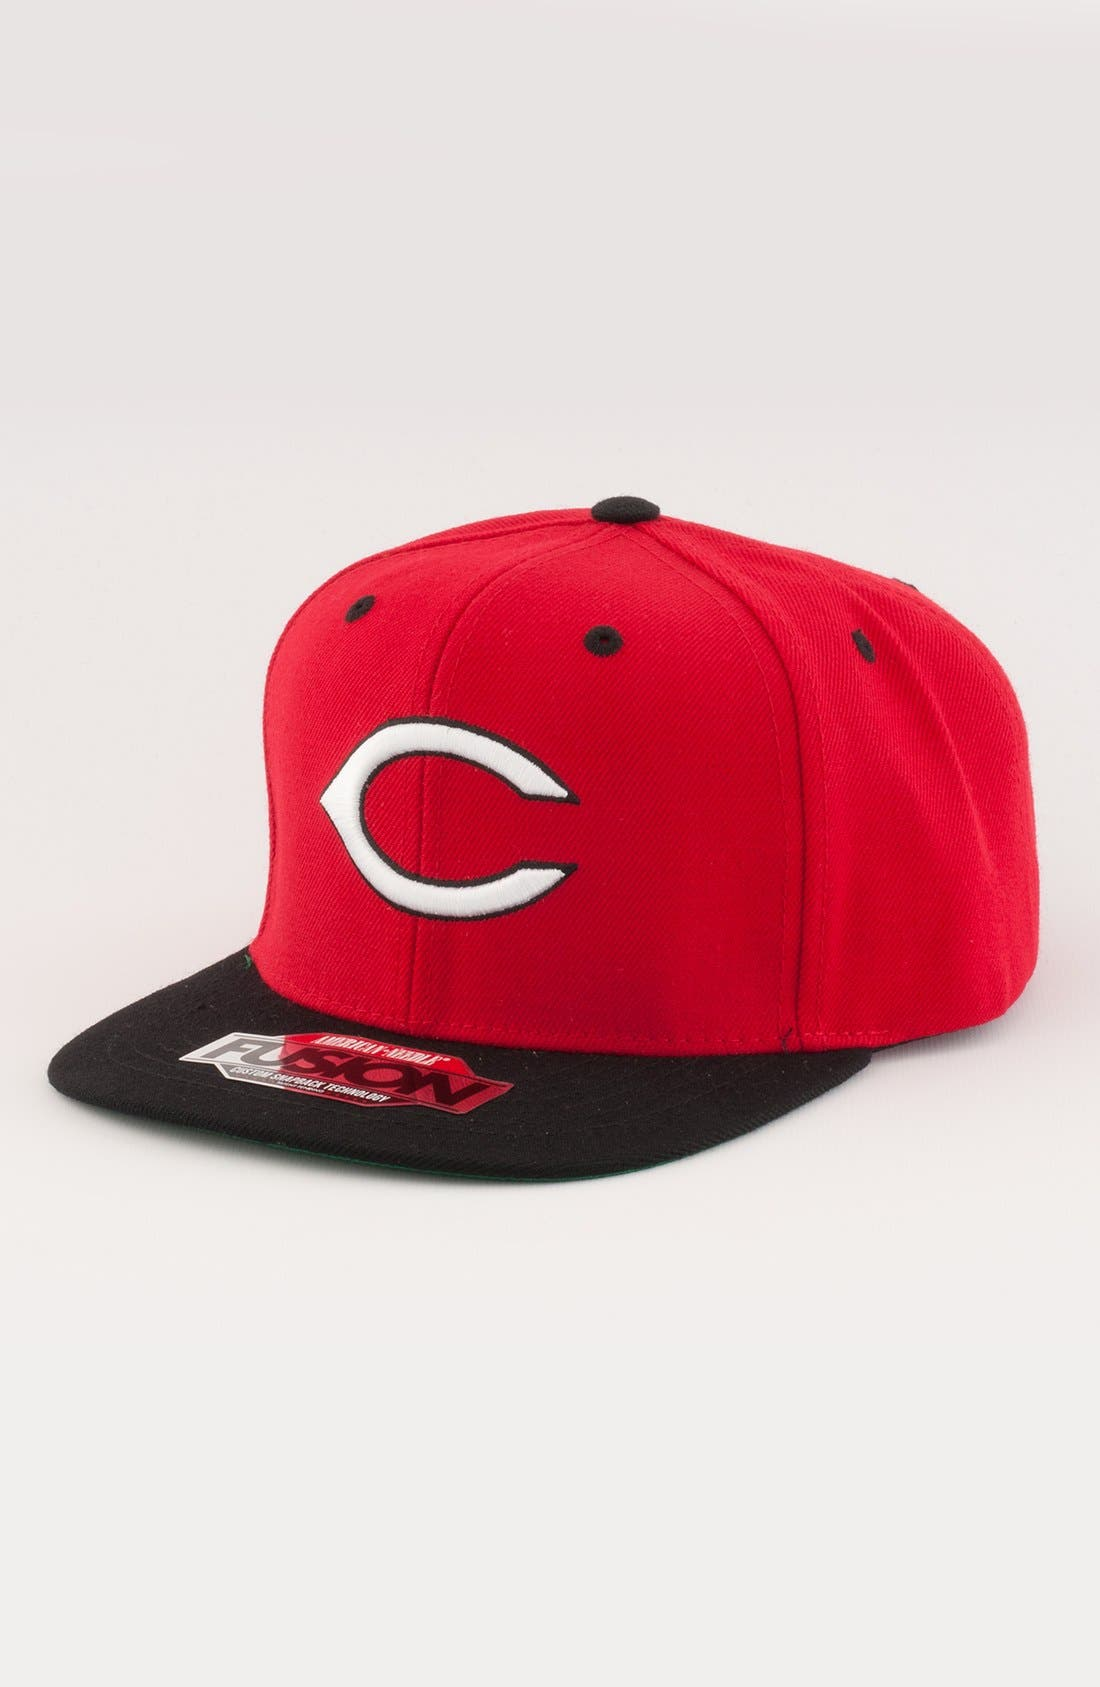 Main Image - American Needle 'Cincinnati Reds - Back 2 Front' Snapback Baseball Cap